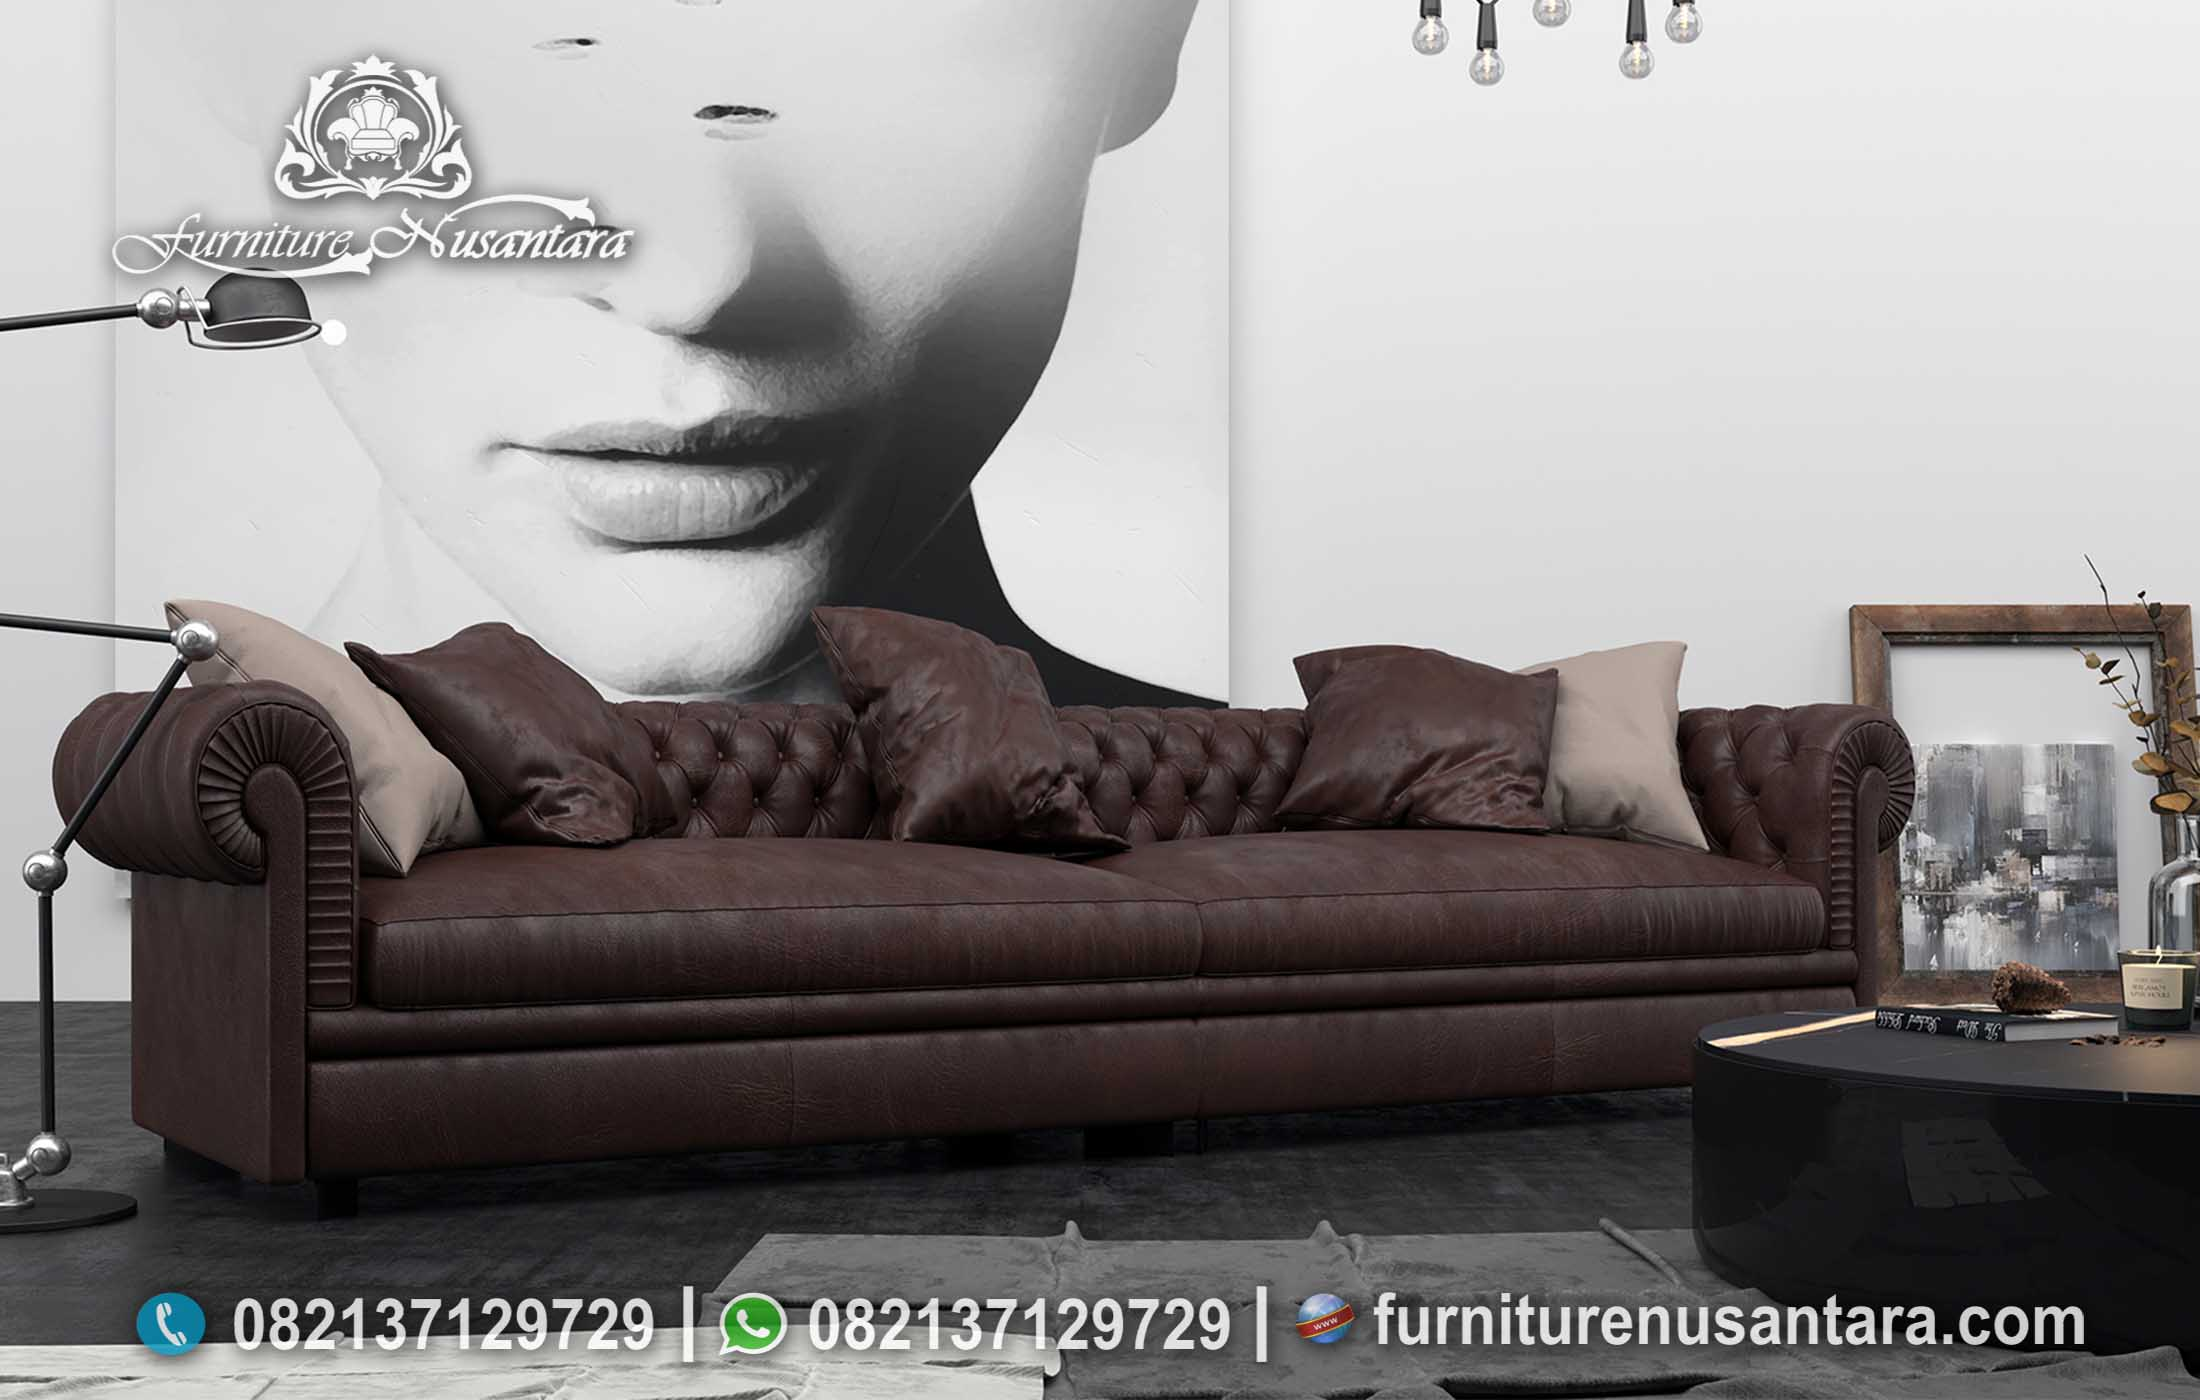 Sofa Minimalis Modern Warna Coklat ST-13, Furniture Nusantara